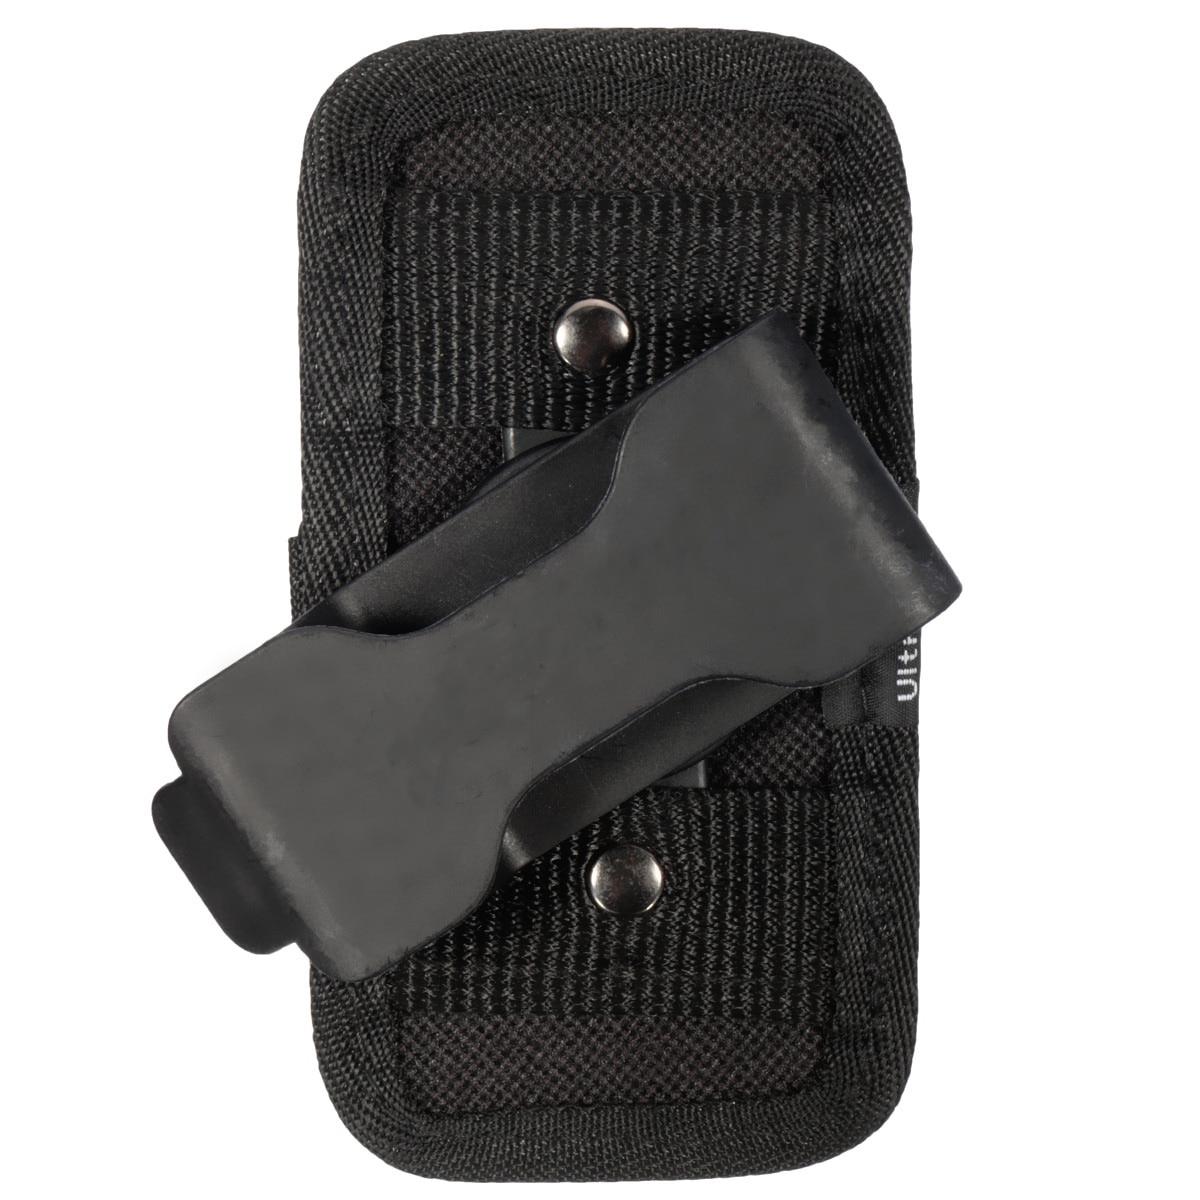 JIGUOOR60 Degree Rotatable High Quality Black Nylon 3 Flashlight Holder Pouch Belt For UltraFire Flashlight Pouch For Hiking цена